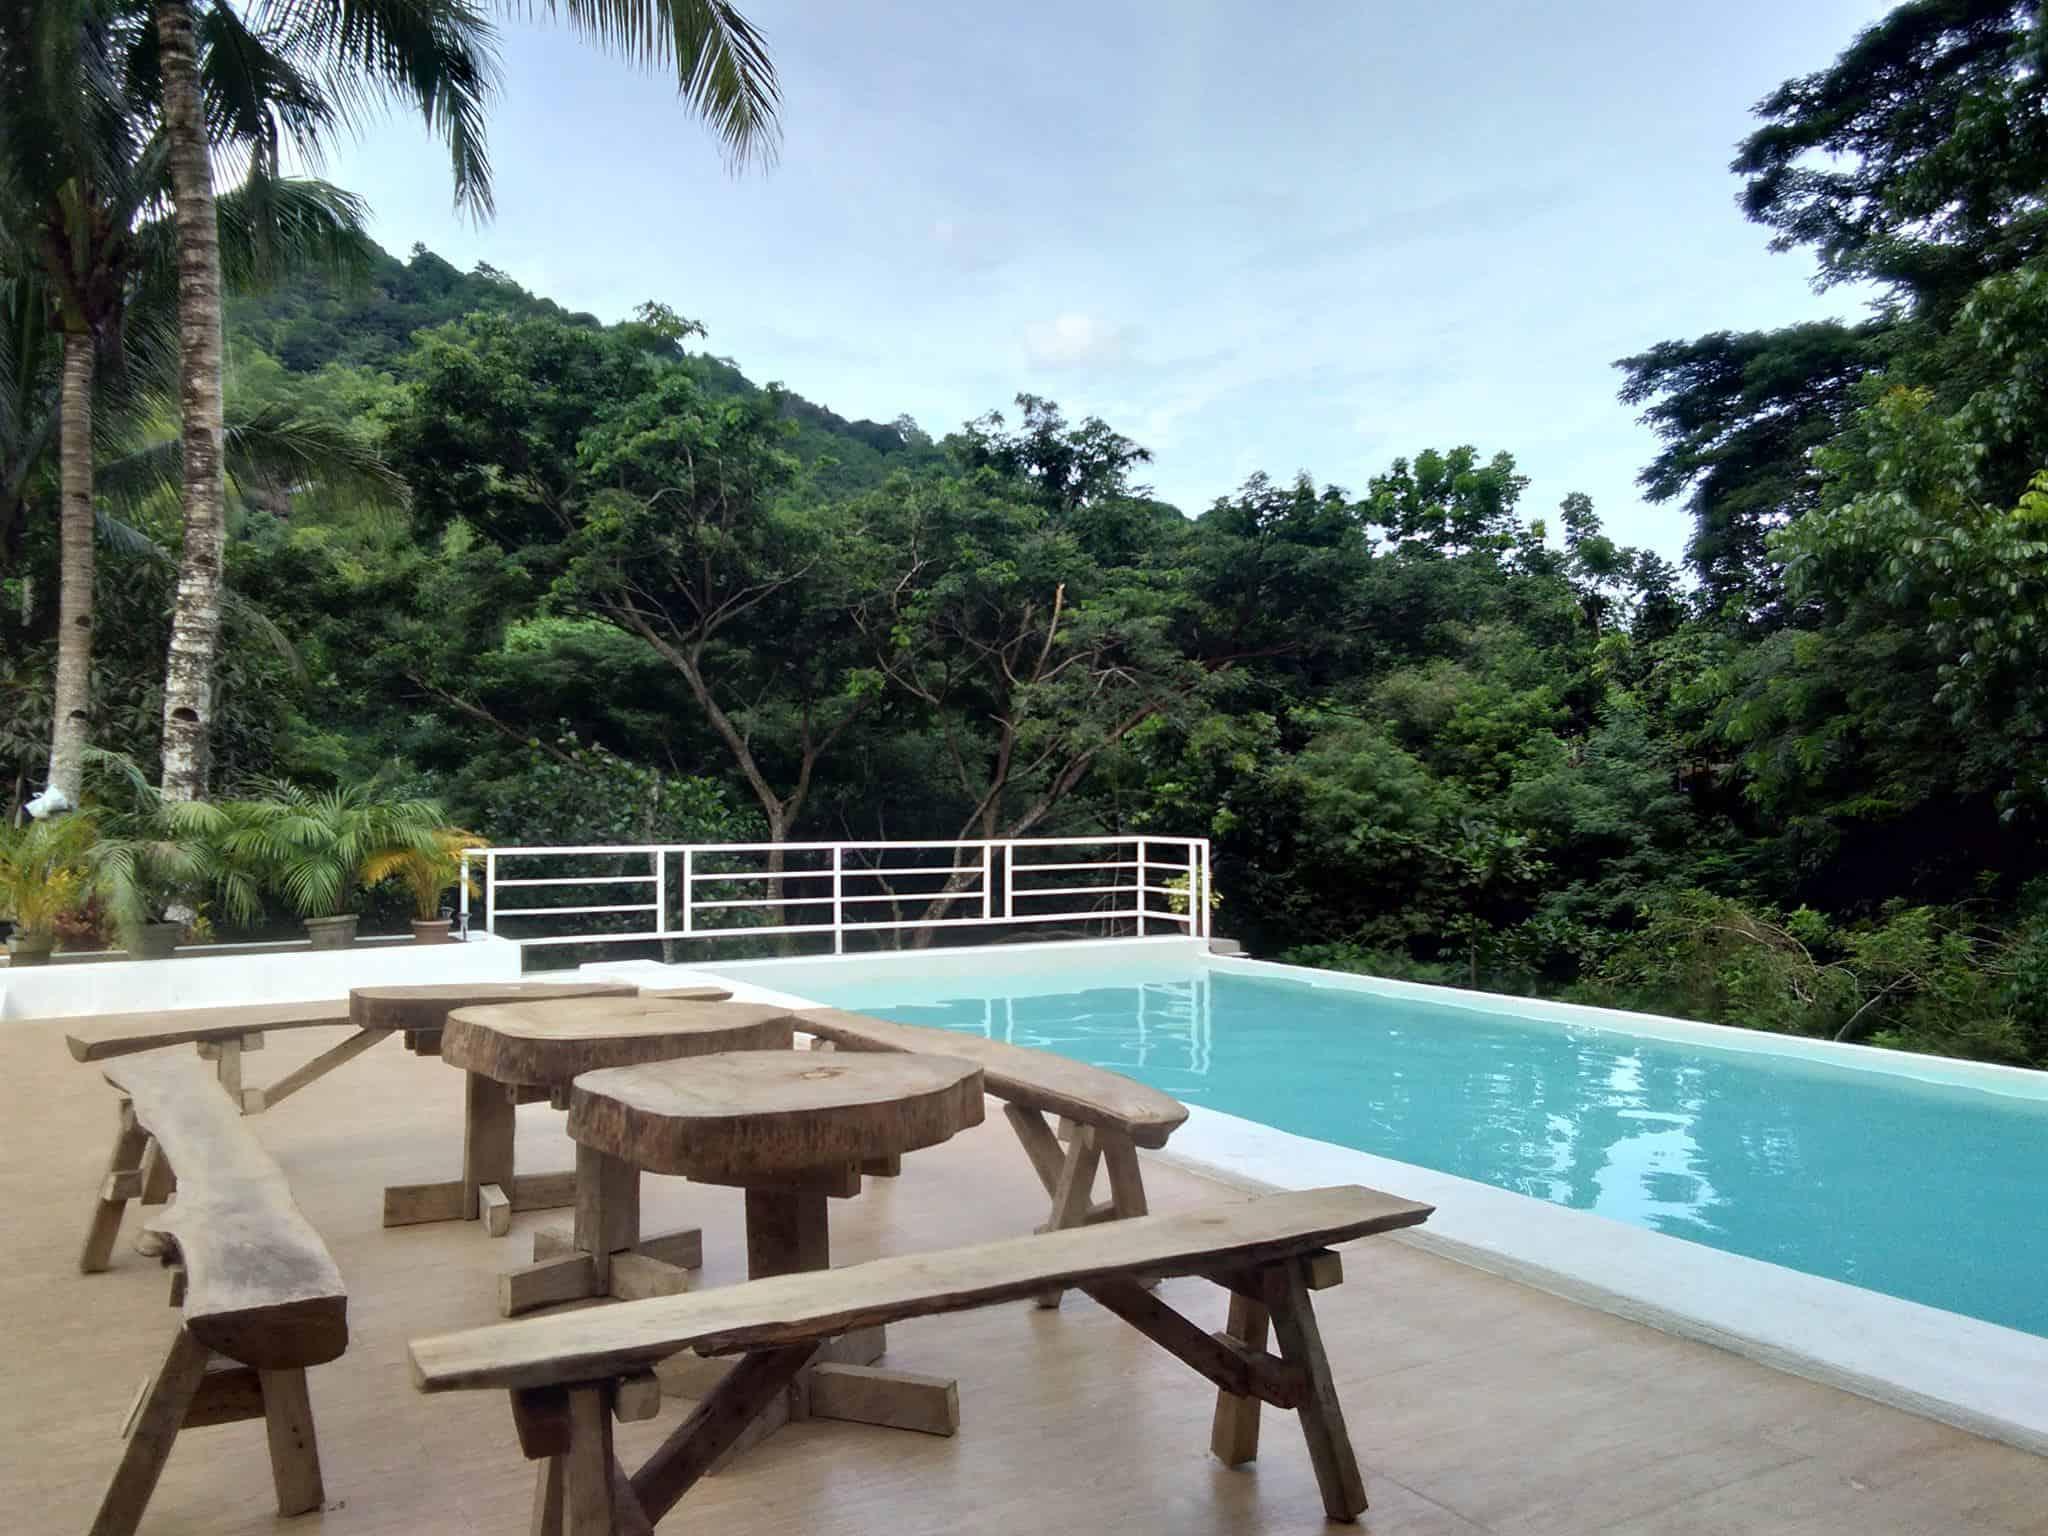 Linao Resort and Hideaway Cebu City (1)